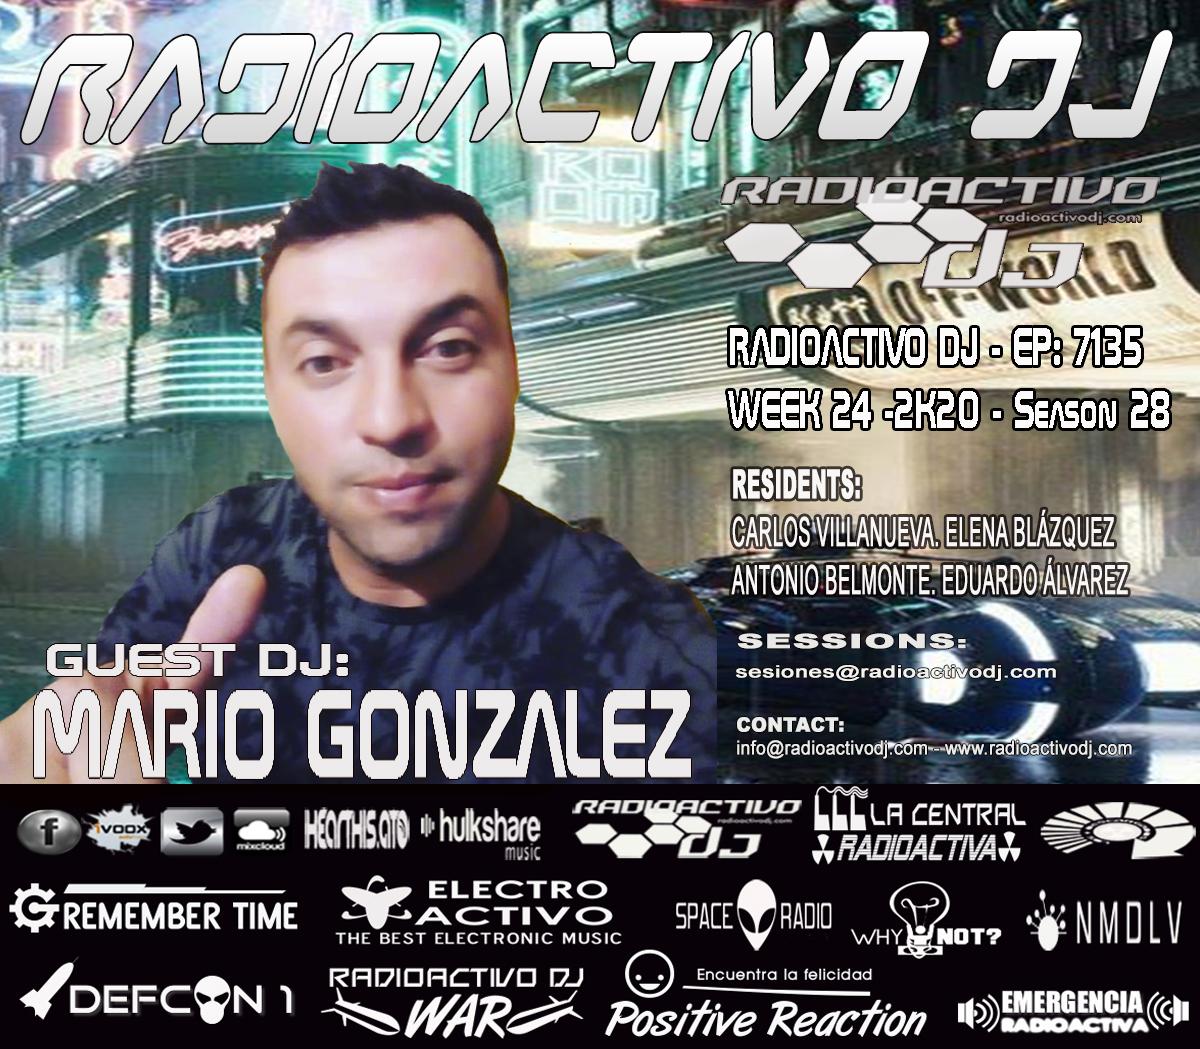 RADIOACTIVO-DJ-24-2020